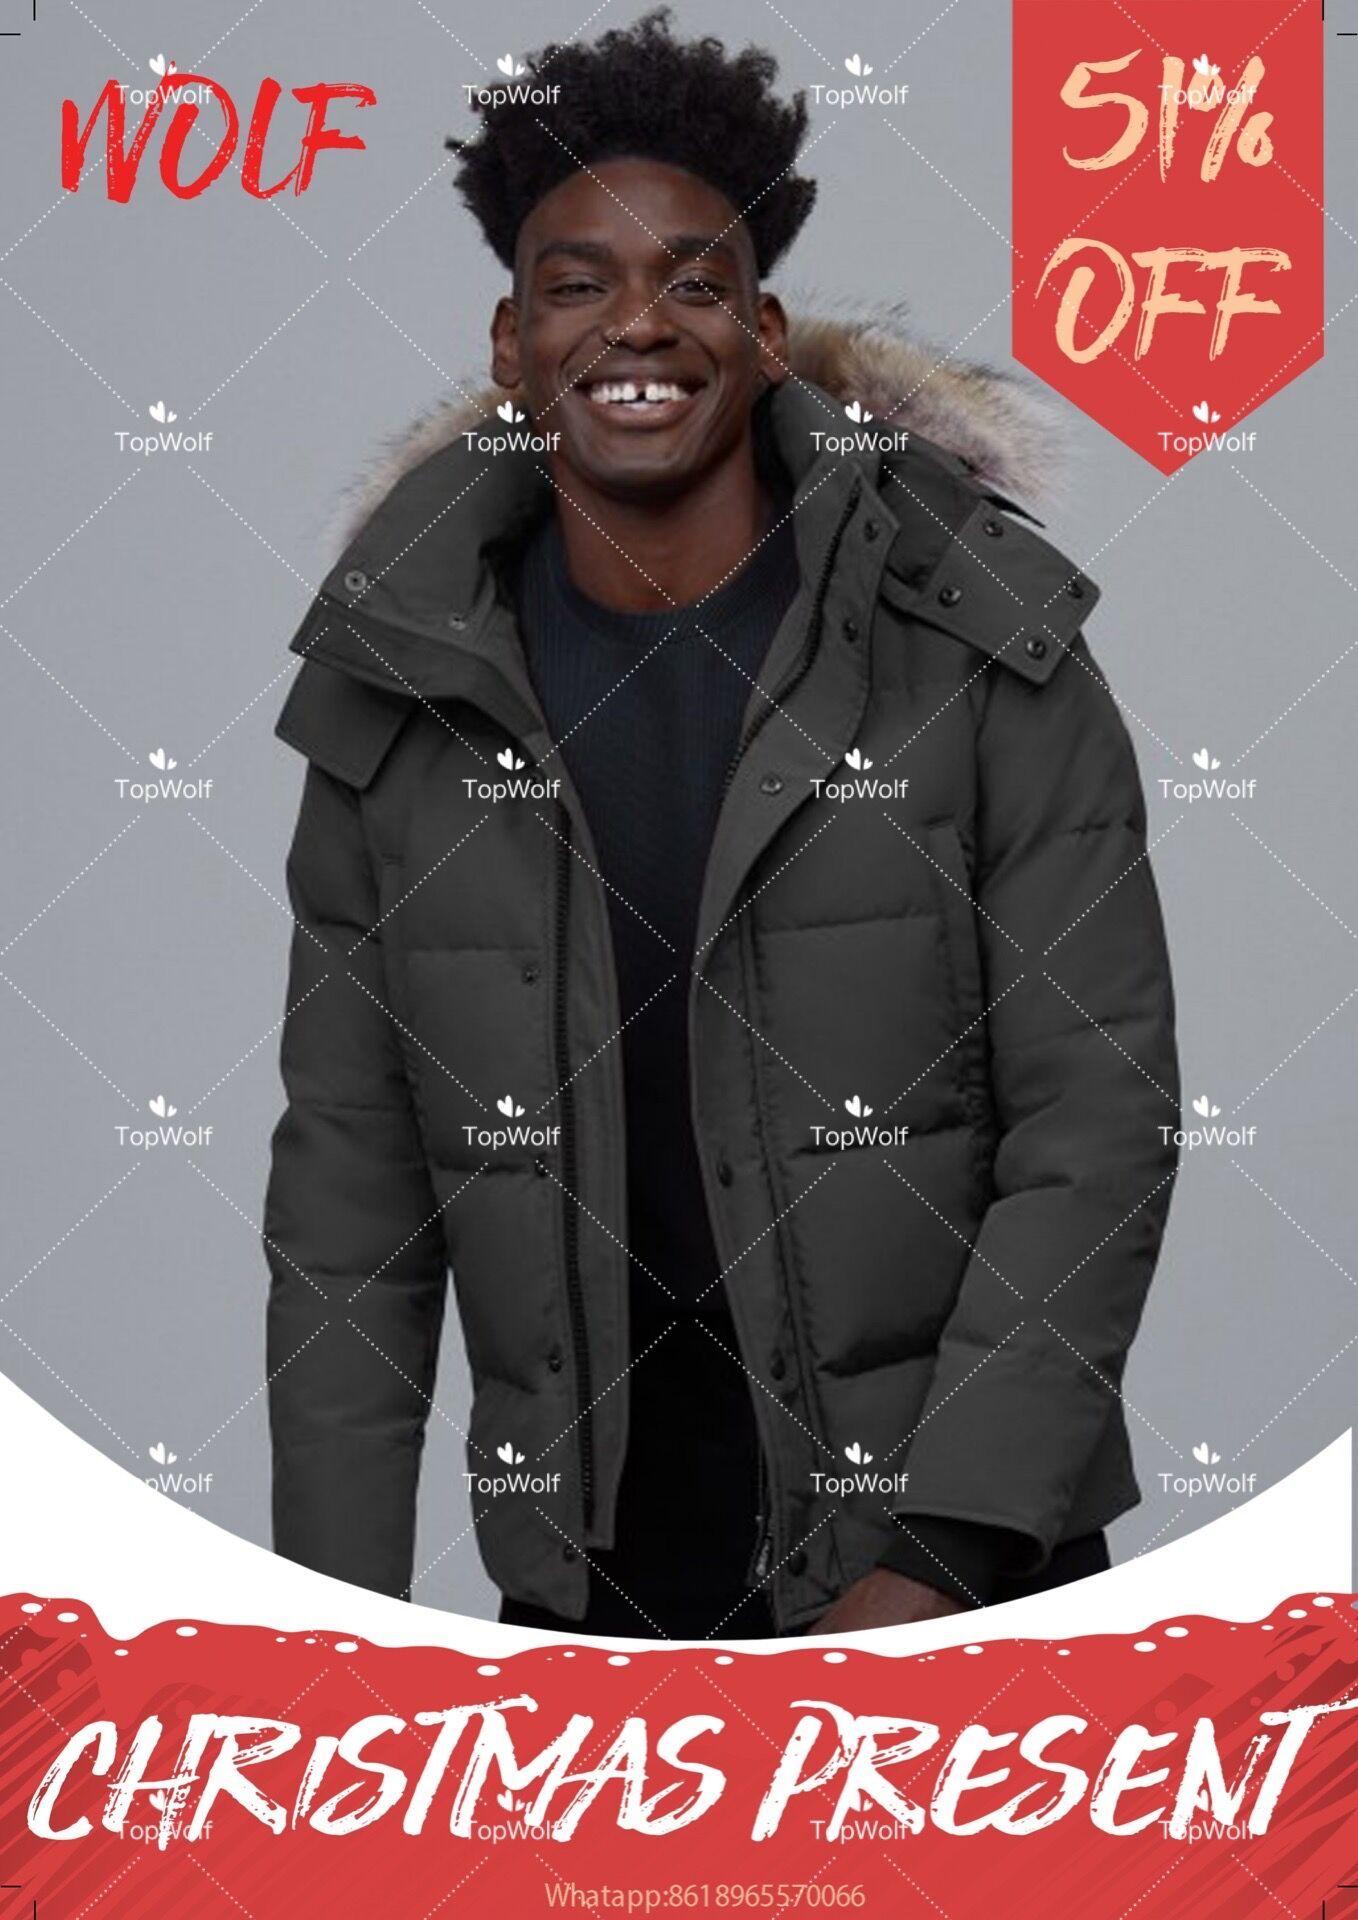 Top Männer Winter Wolf Fu Travel Parka Daunenjacke Lange Puffermäntel Warme Mantel Jaqueta Mantel Outwear